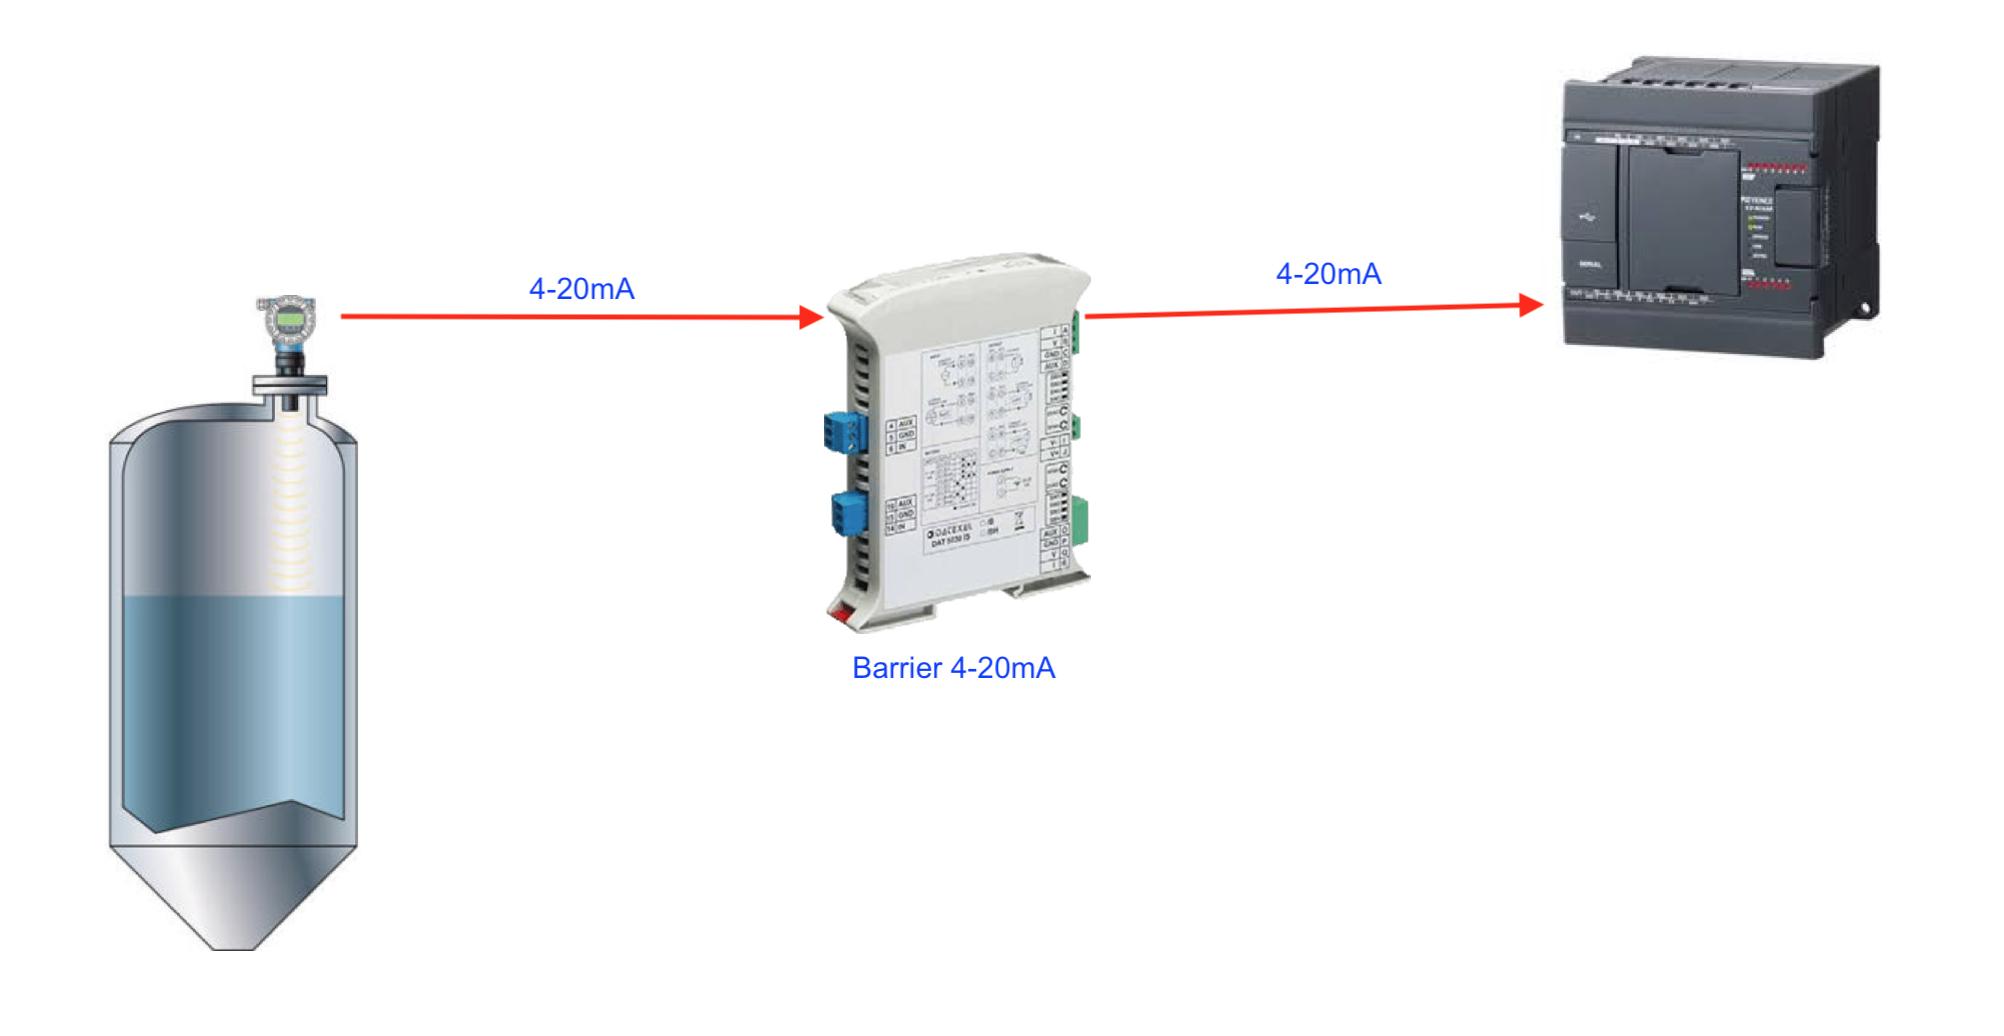 Cảm biến đo mức kèm bộ barrier 4-20mA